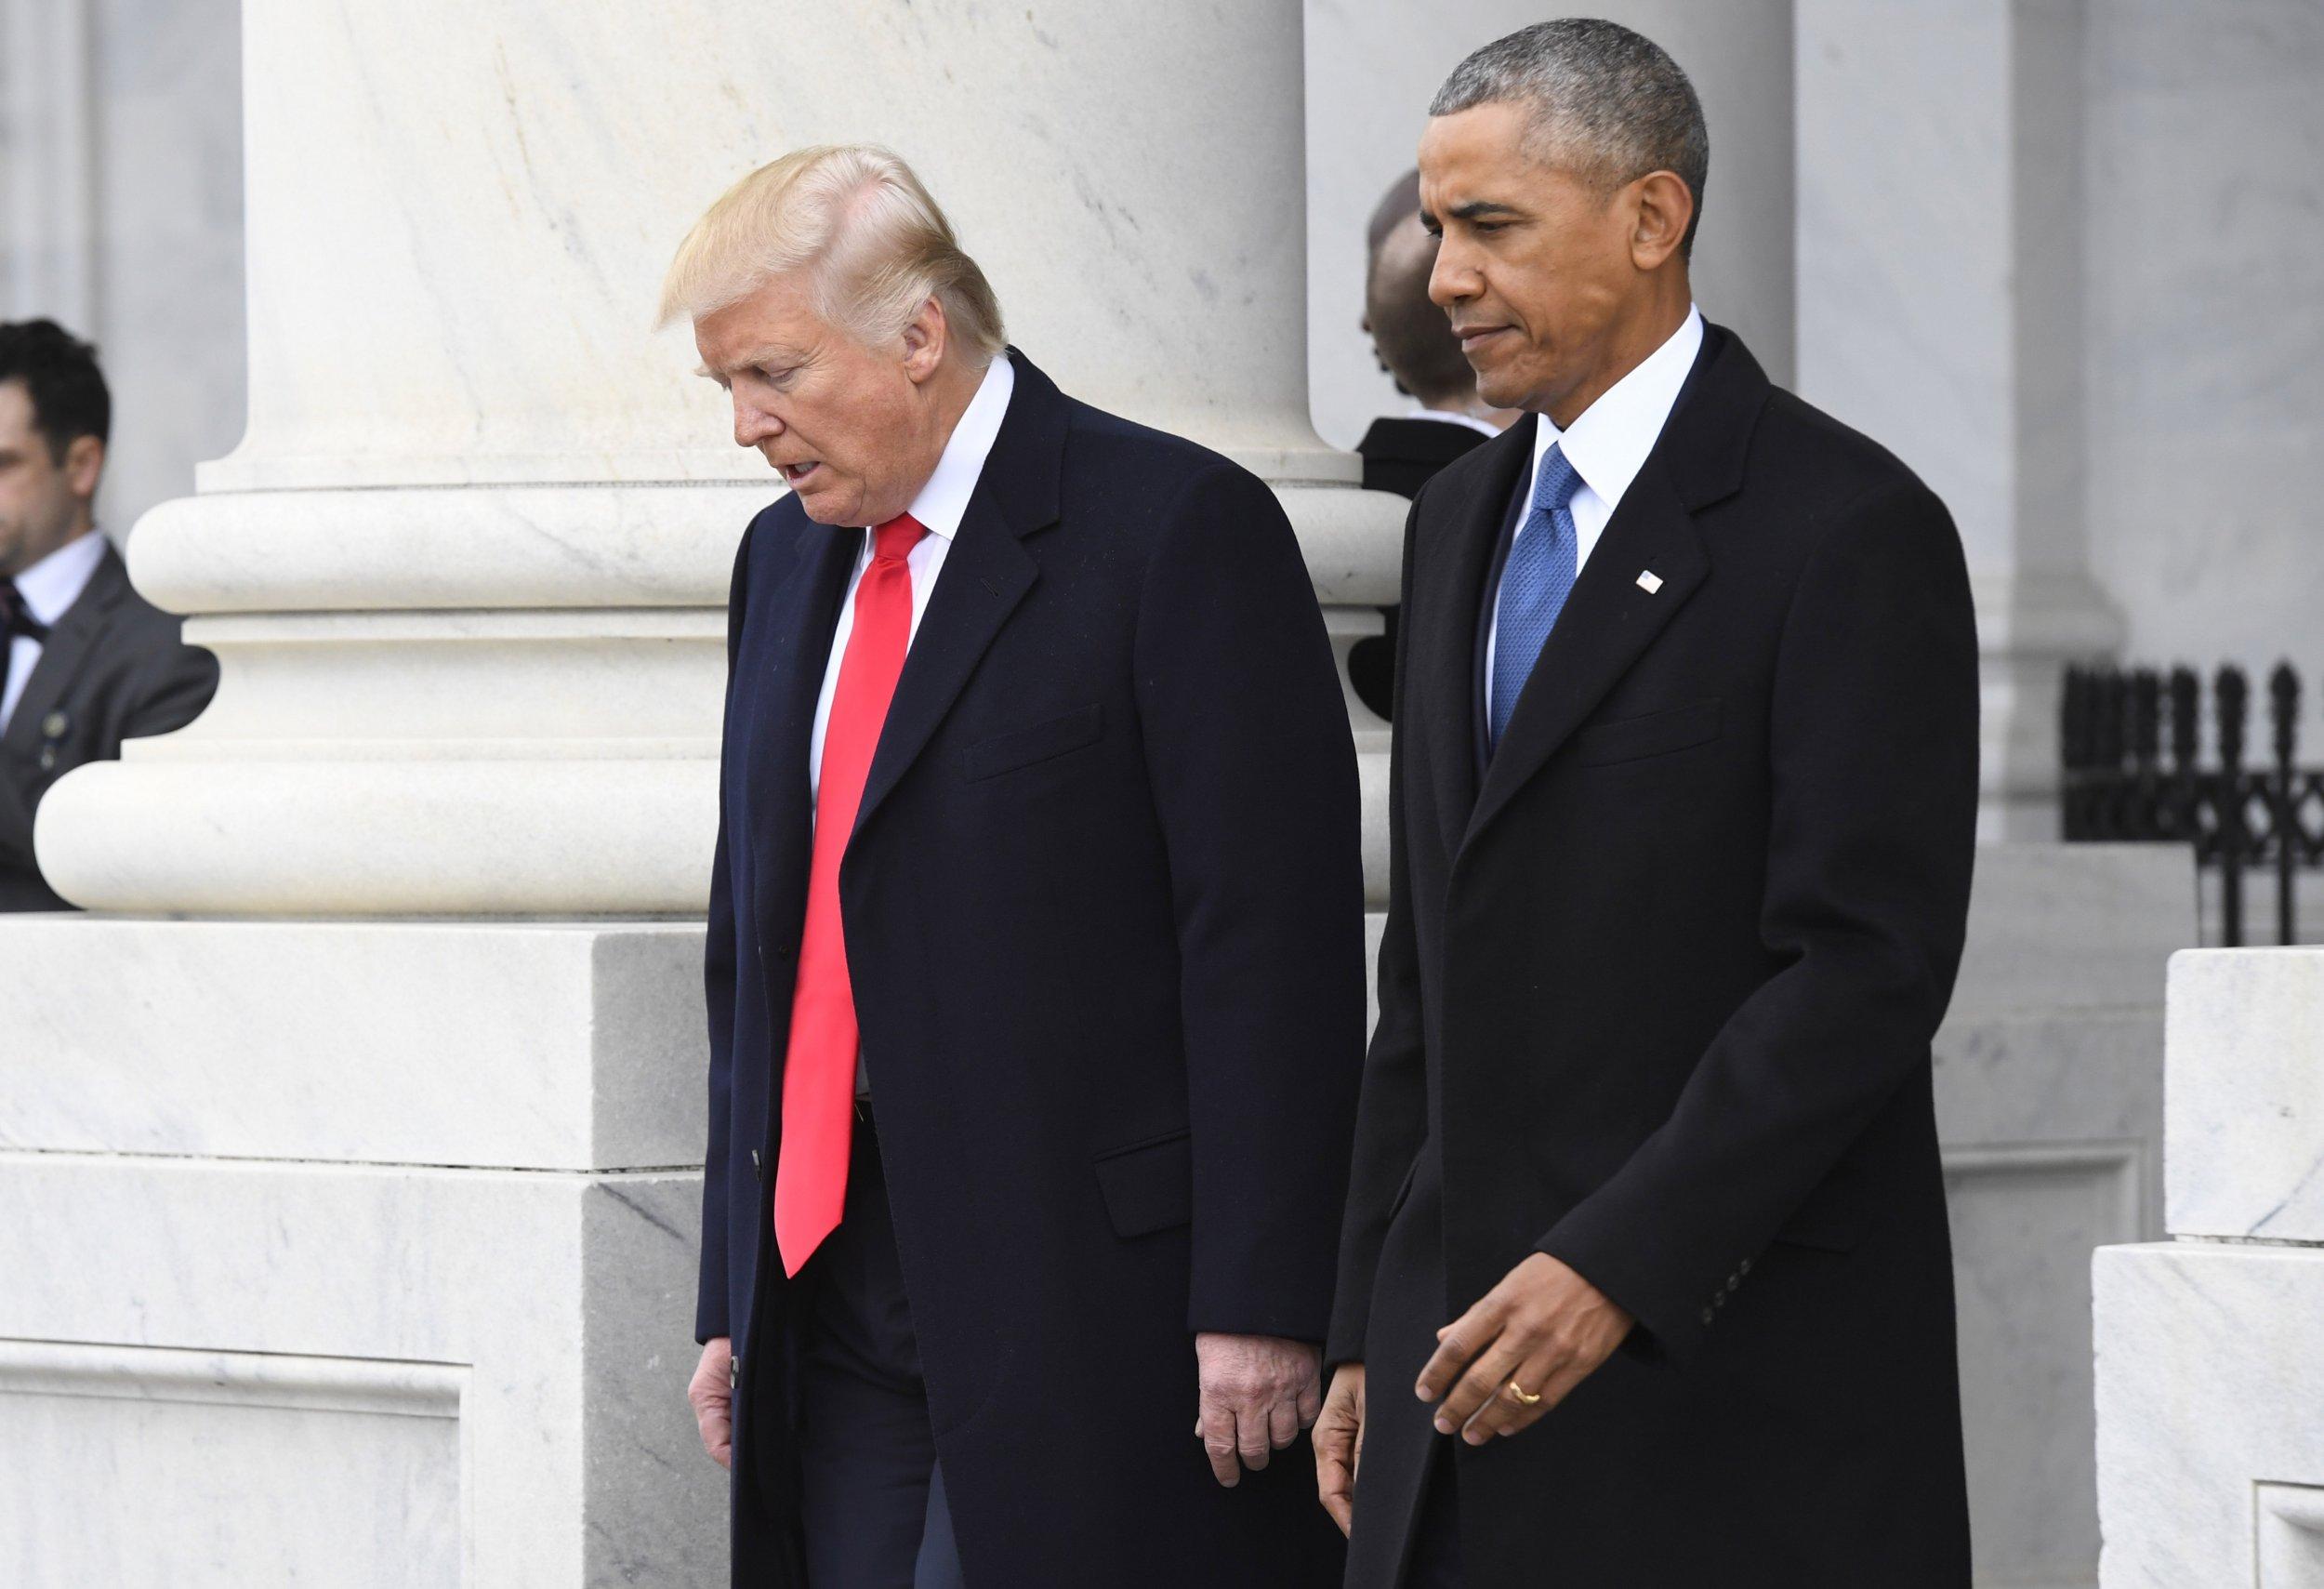 Obama and Trump walking